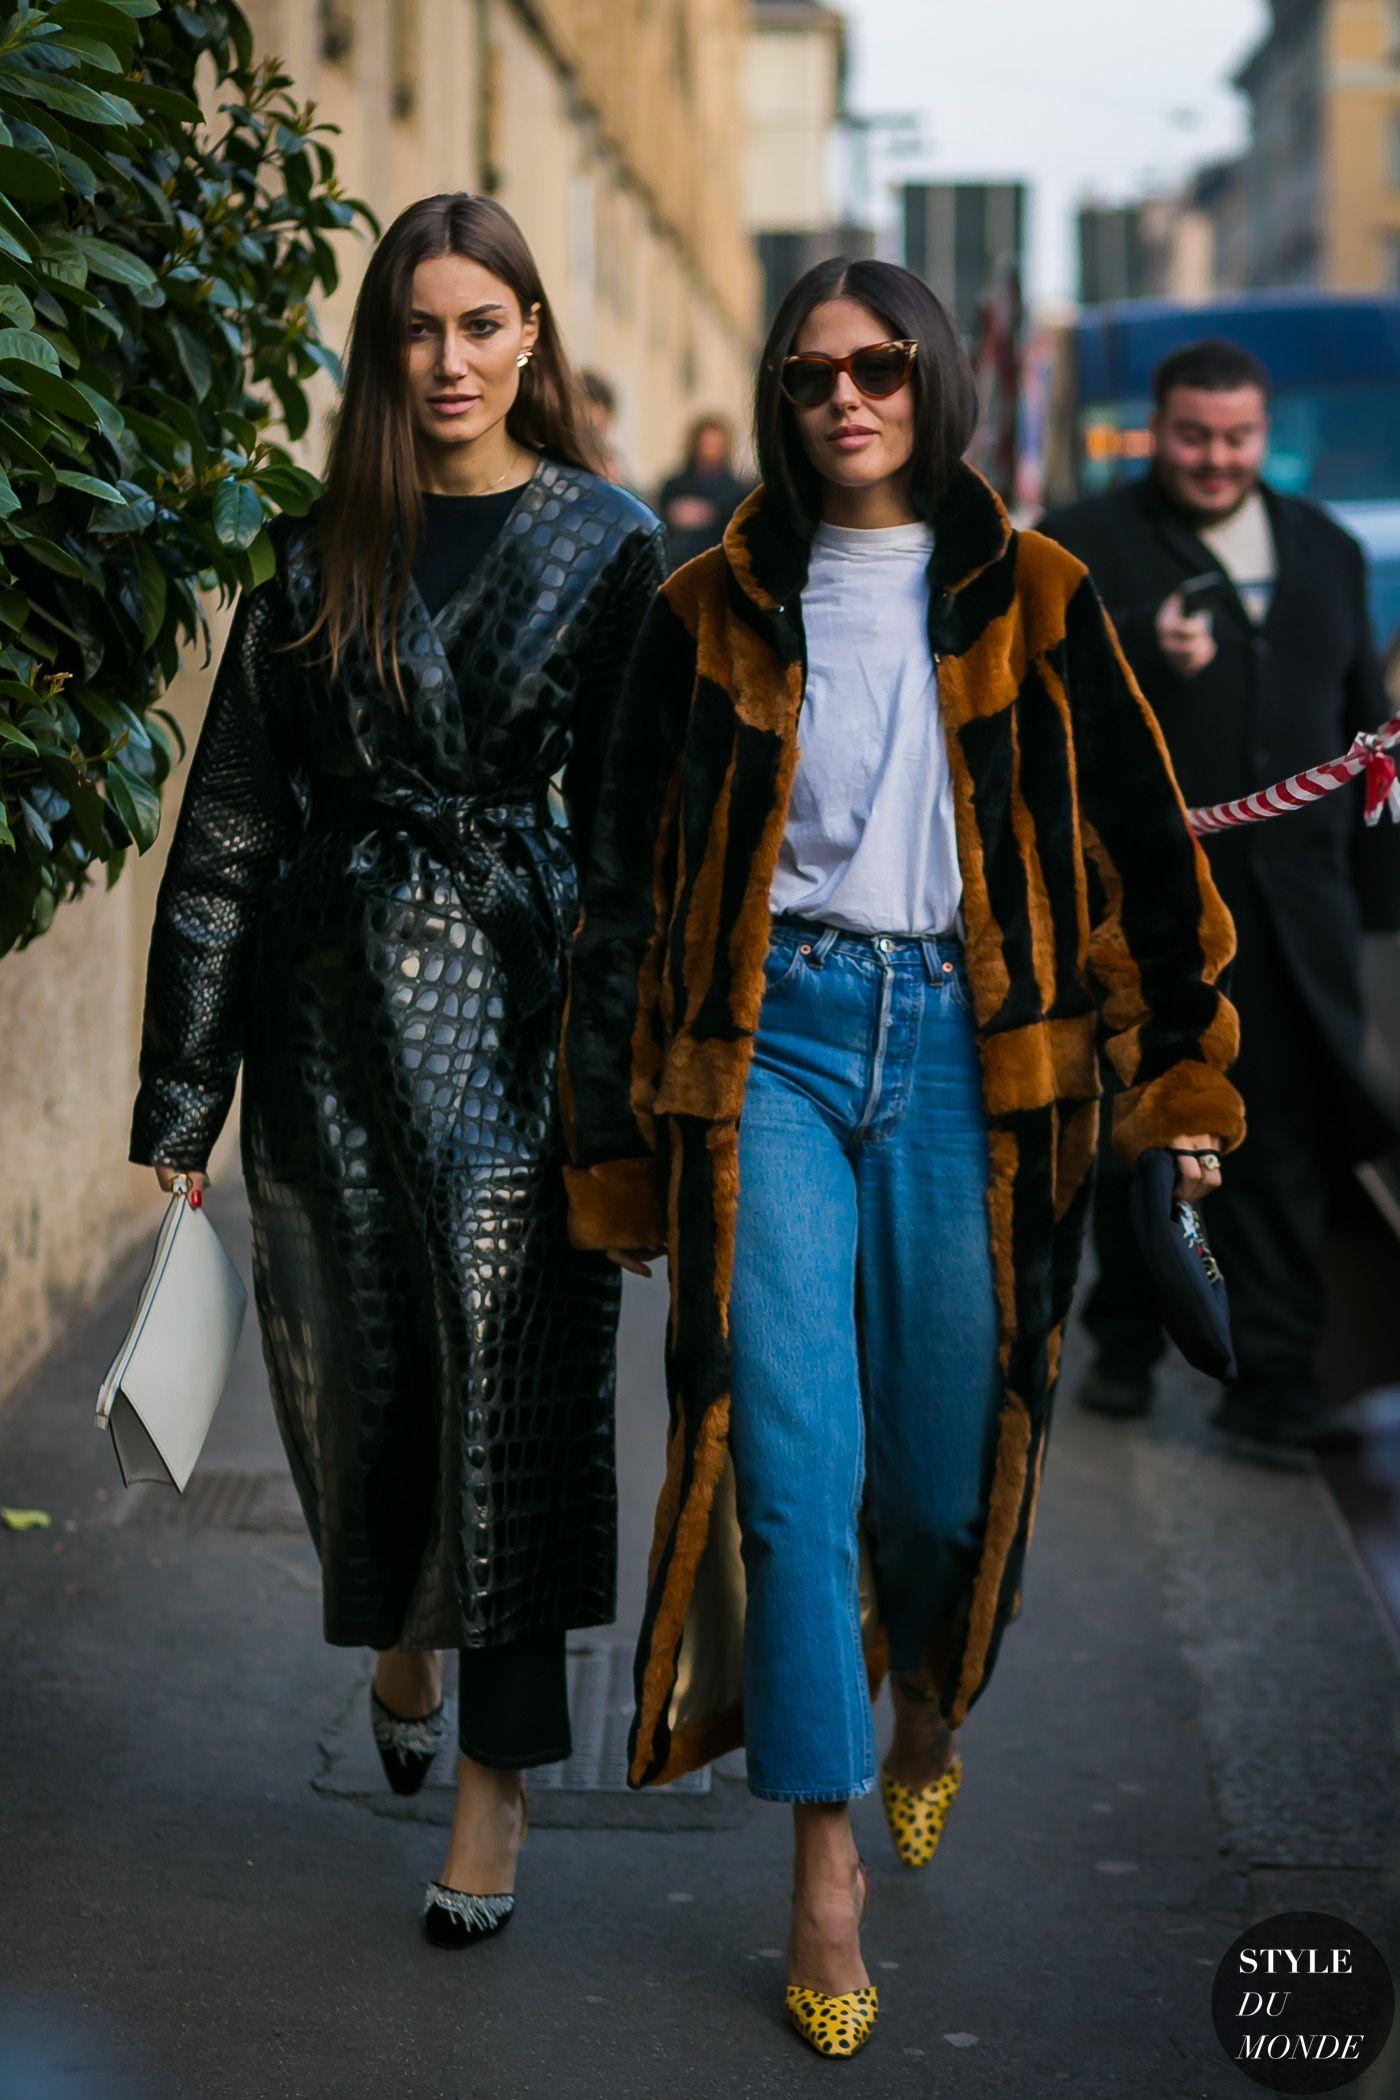 Giorgia Tordini and Gilda Ambrosio by STYLEDUMONDE Street Style Fashion Photography0E2A4257